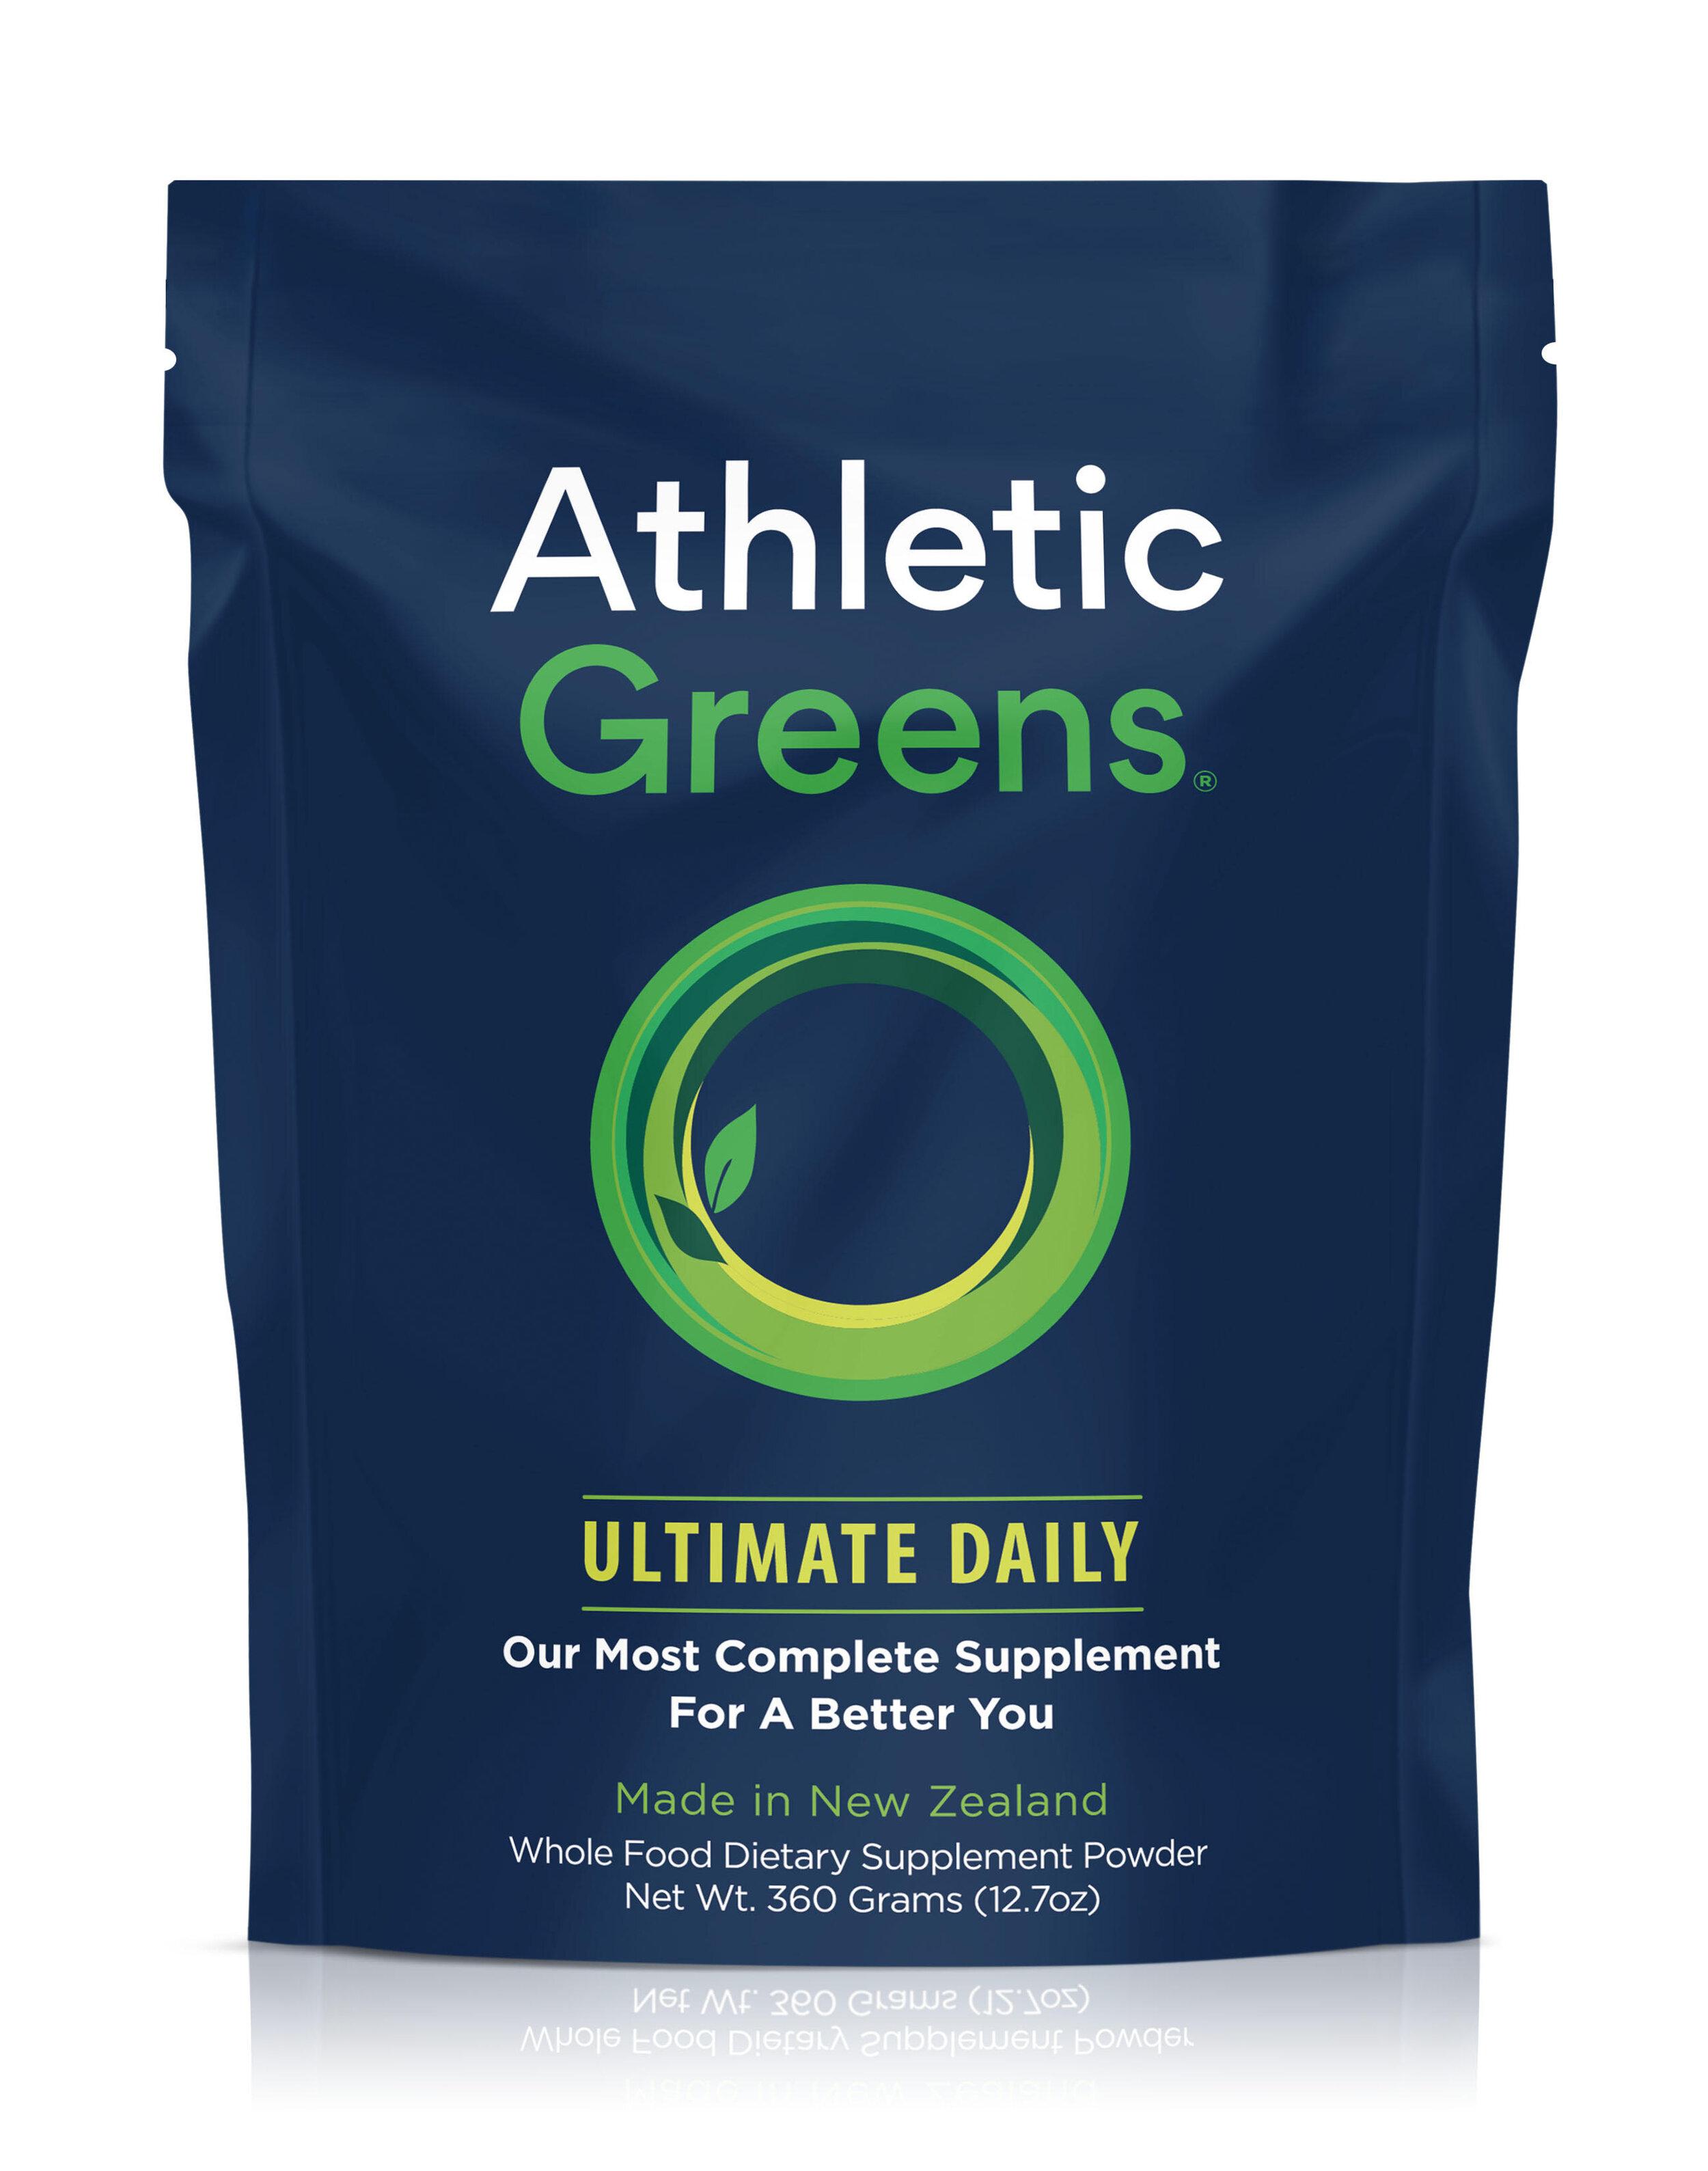 gifts-for-endurance-junkies-athletic-greens.jpg